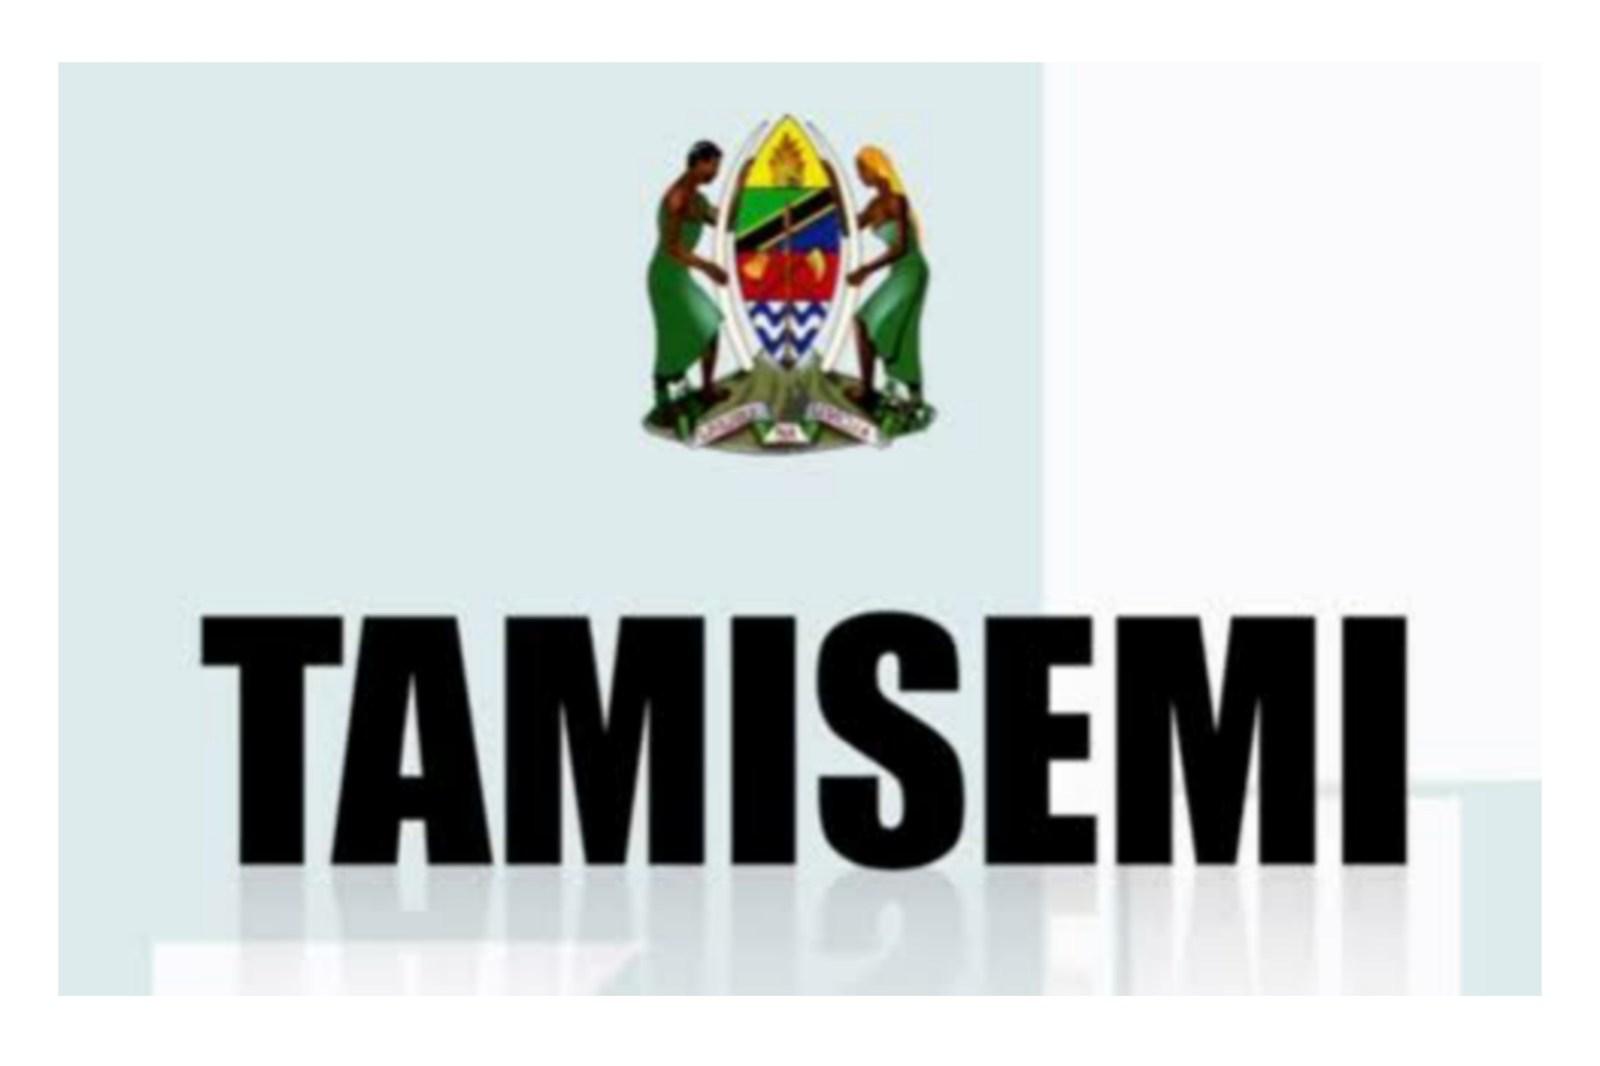 TAMISEMI Extended Teachers Job Application Deadline 2020/2021